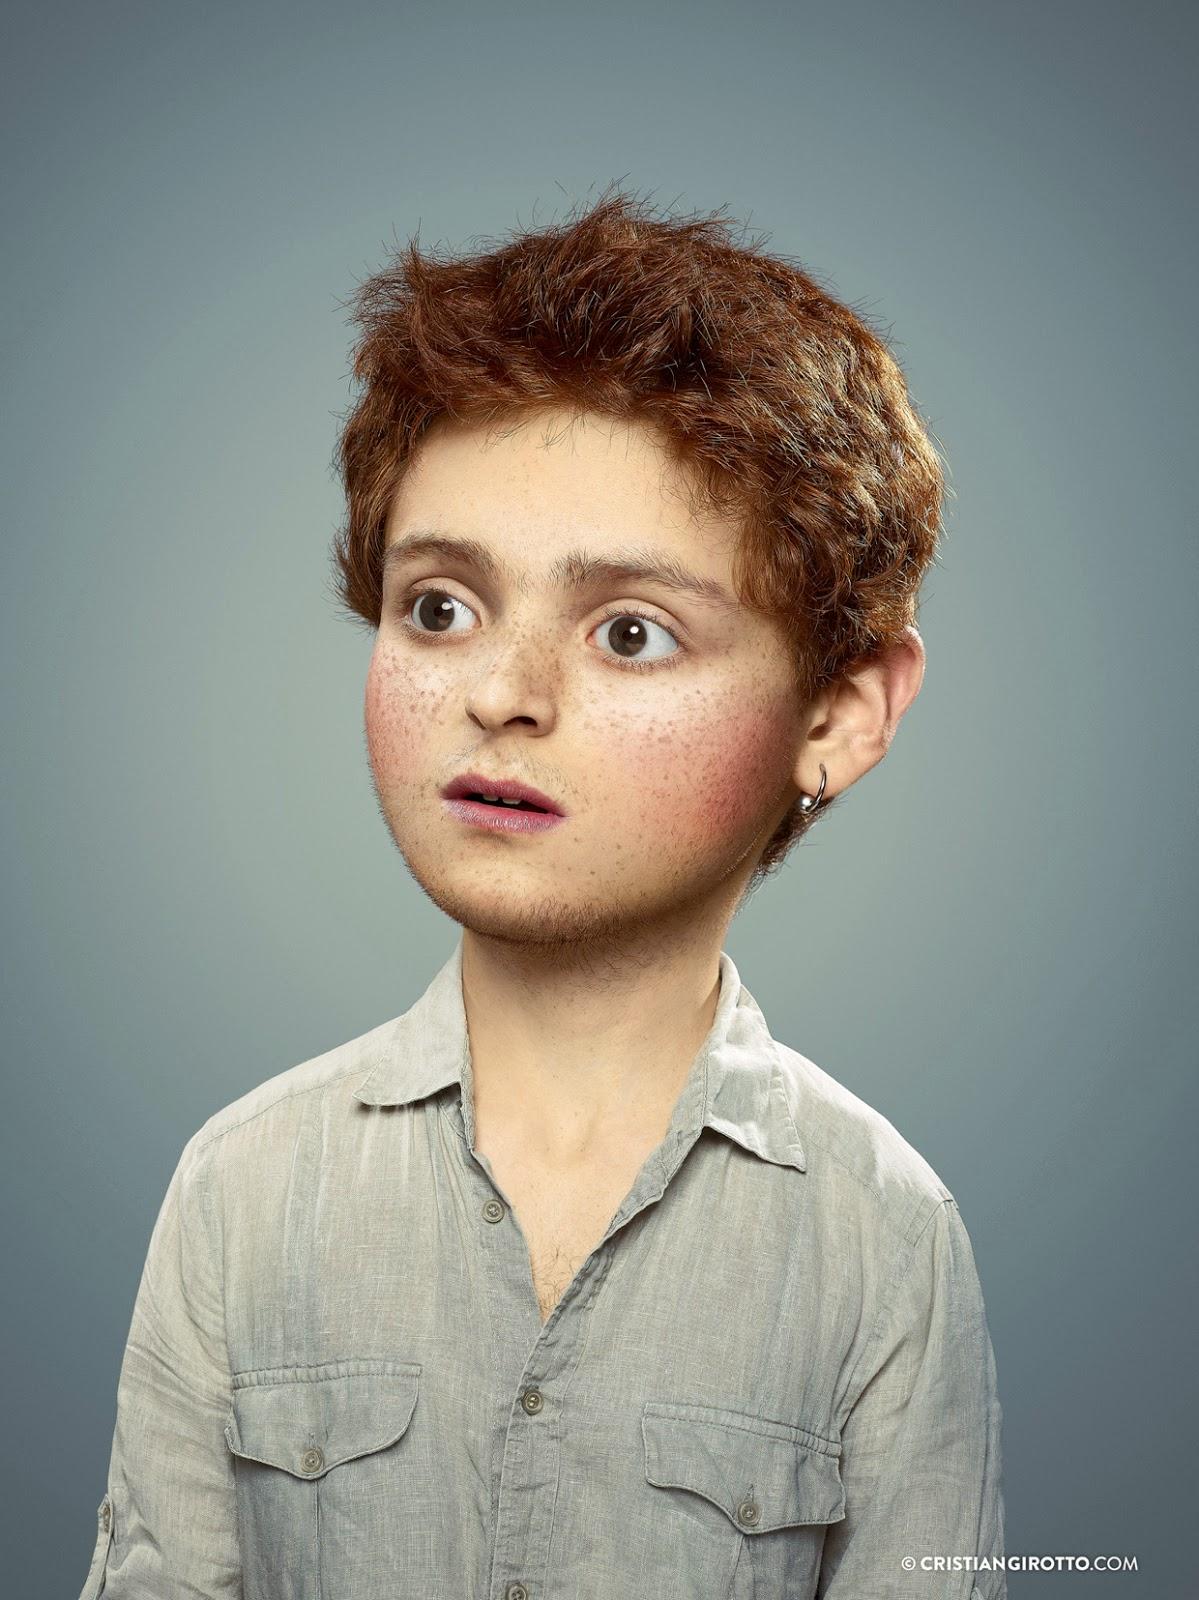 Cristian Girotto, L'Enfant exterior